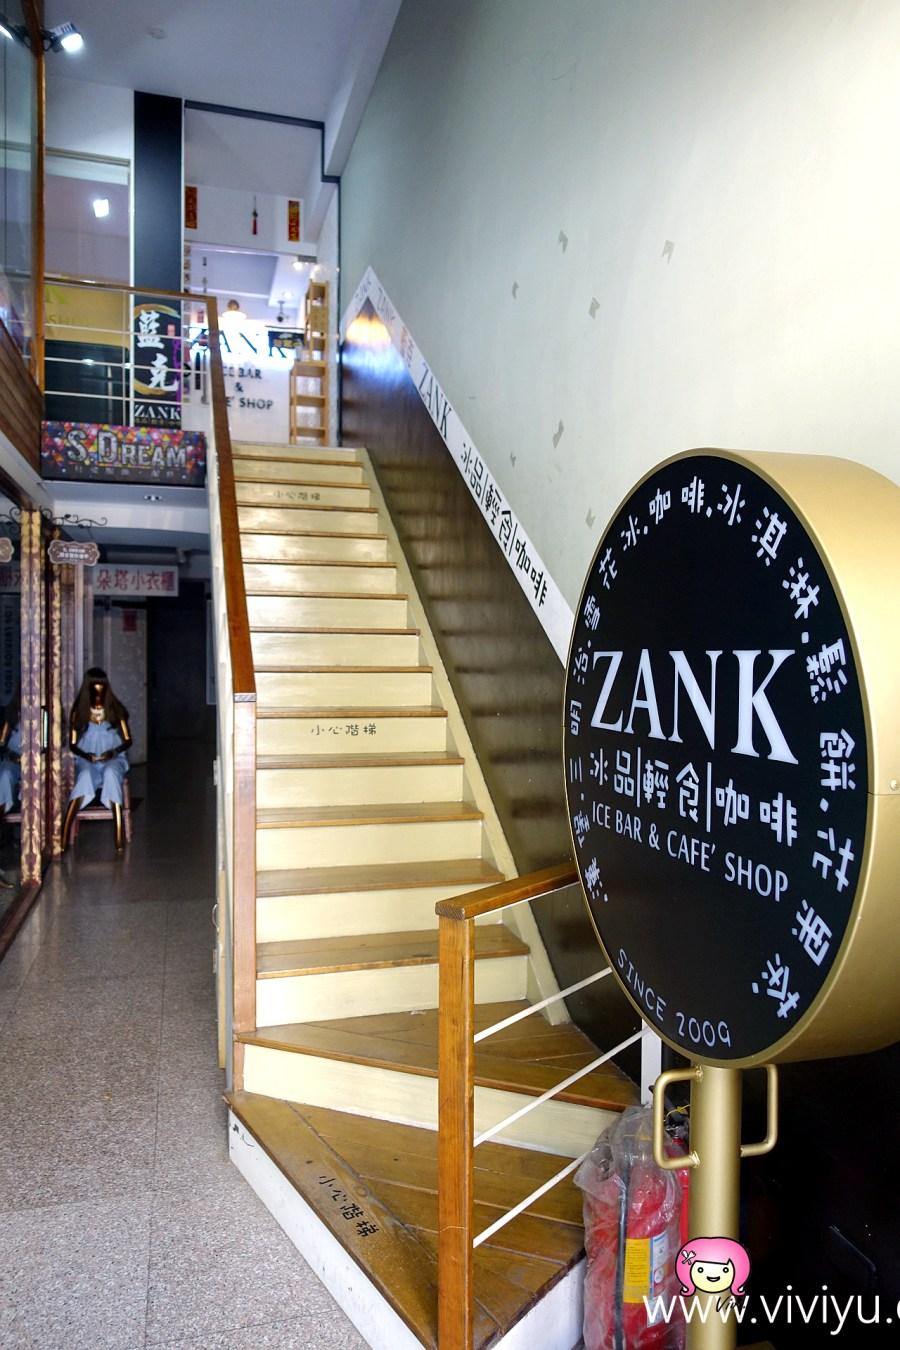 ZANK藍克,冰品特輯,桃園冰品,桃園火車站,桃園美食,芒果冰 @VIVIYU小世界